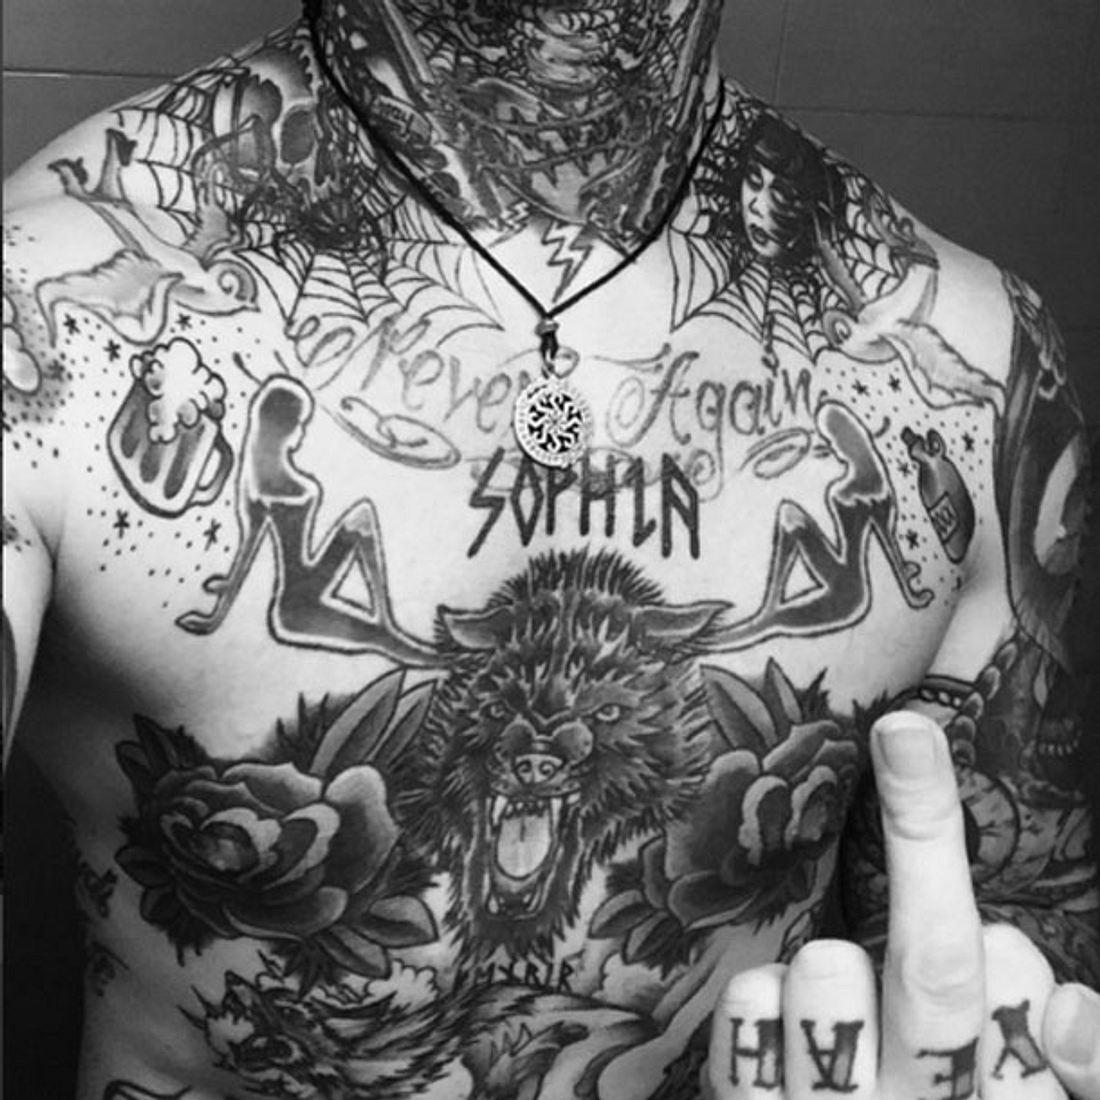 Andy LaPlegua zeigt sein Sophia-Tattoo